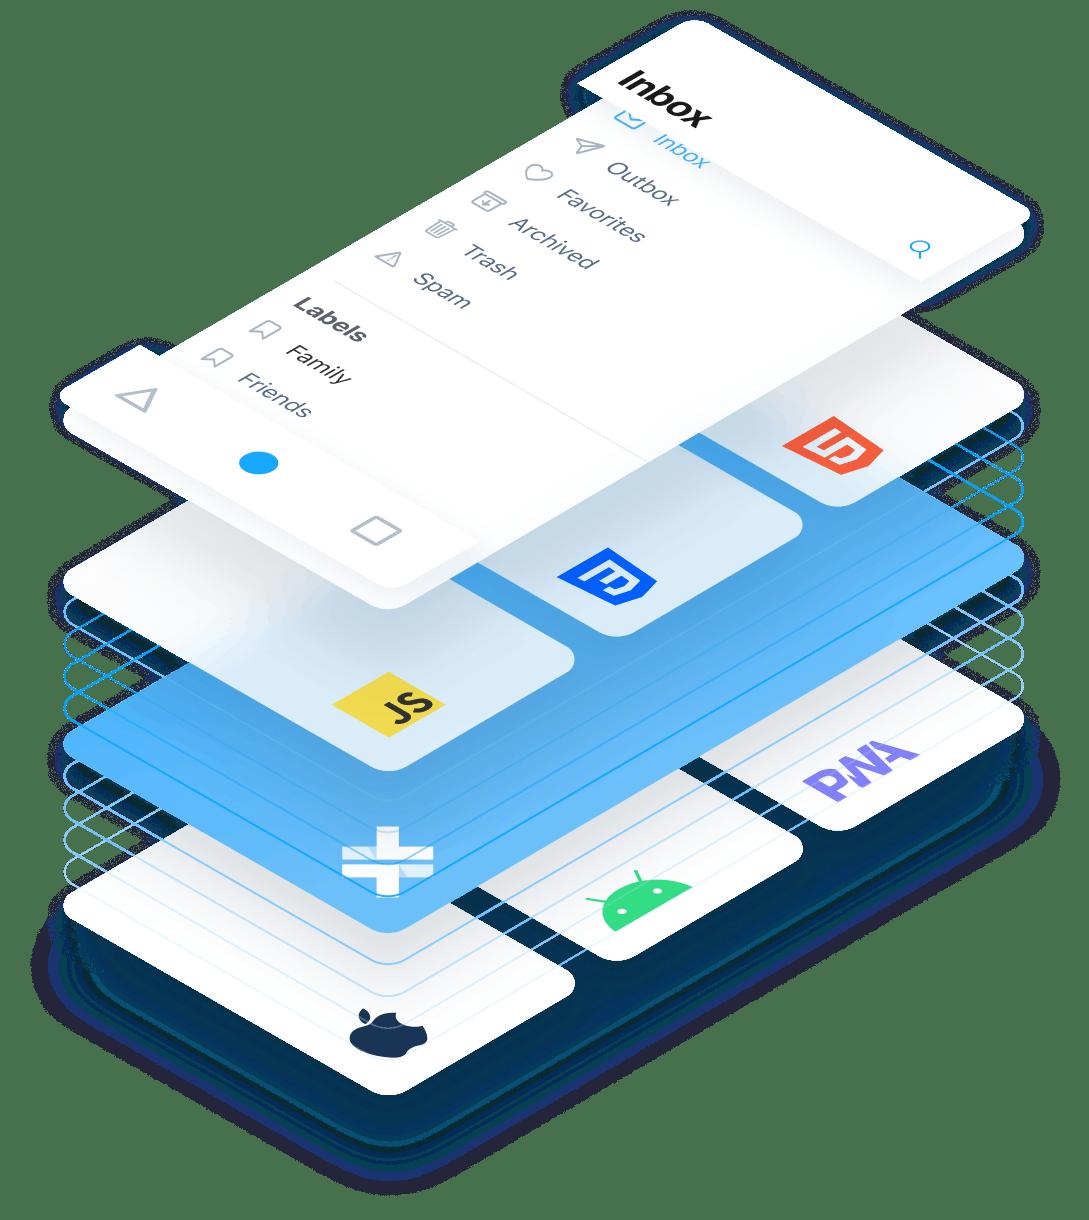 Ionic app layers